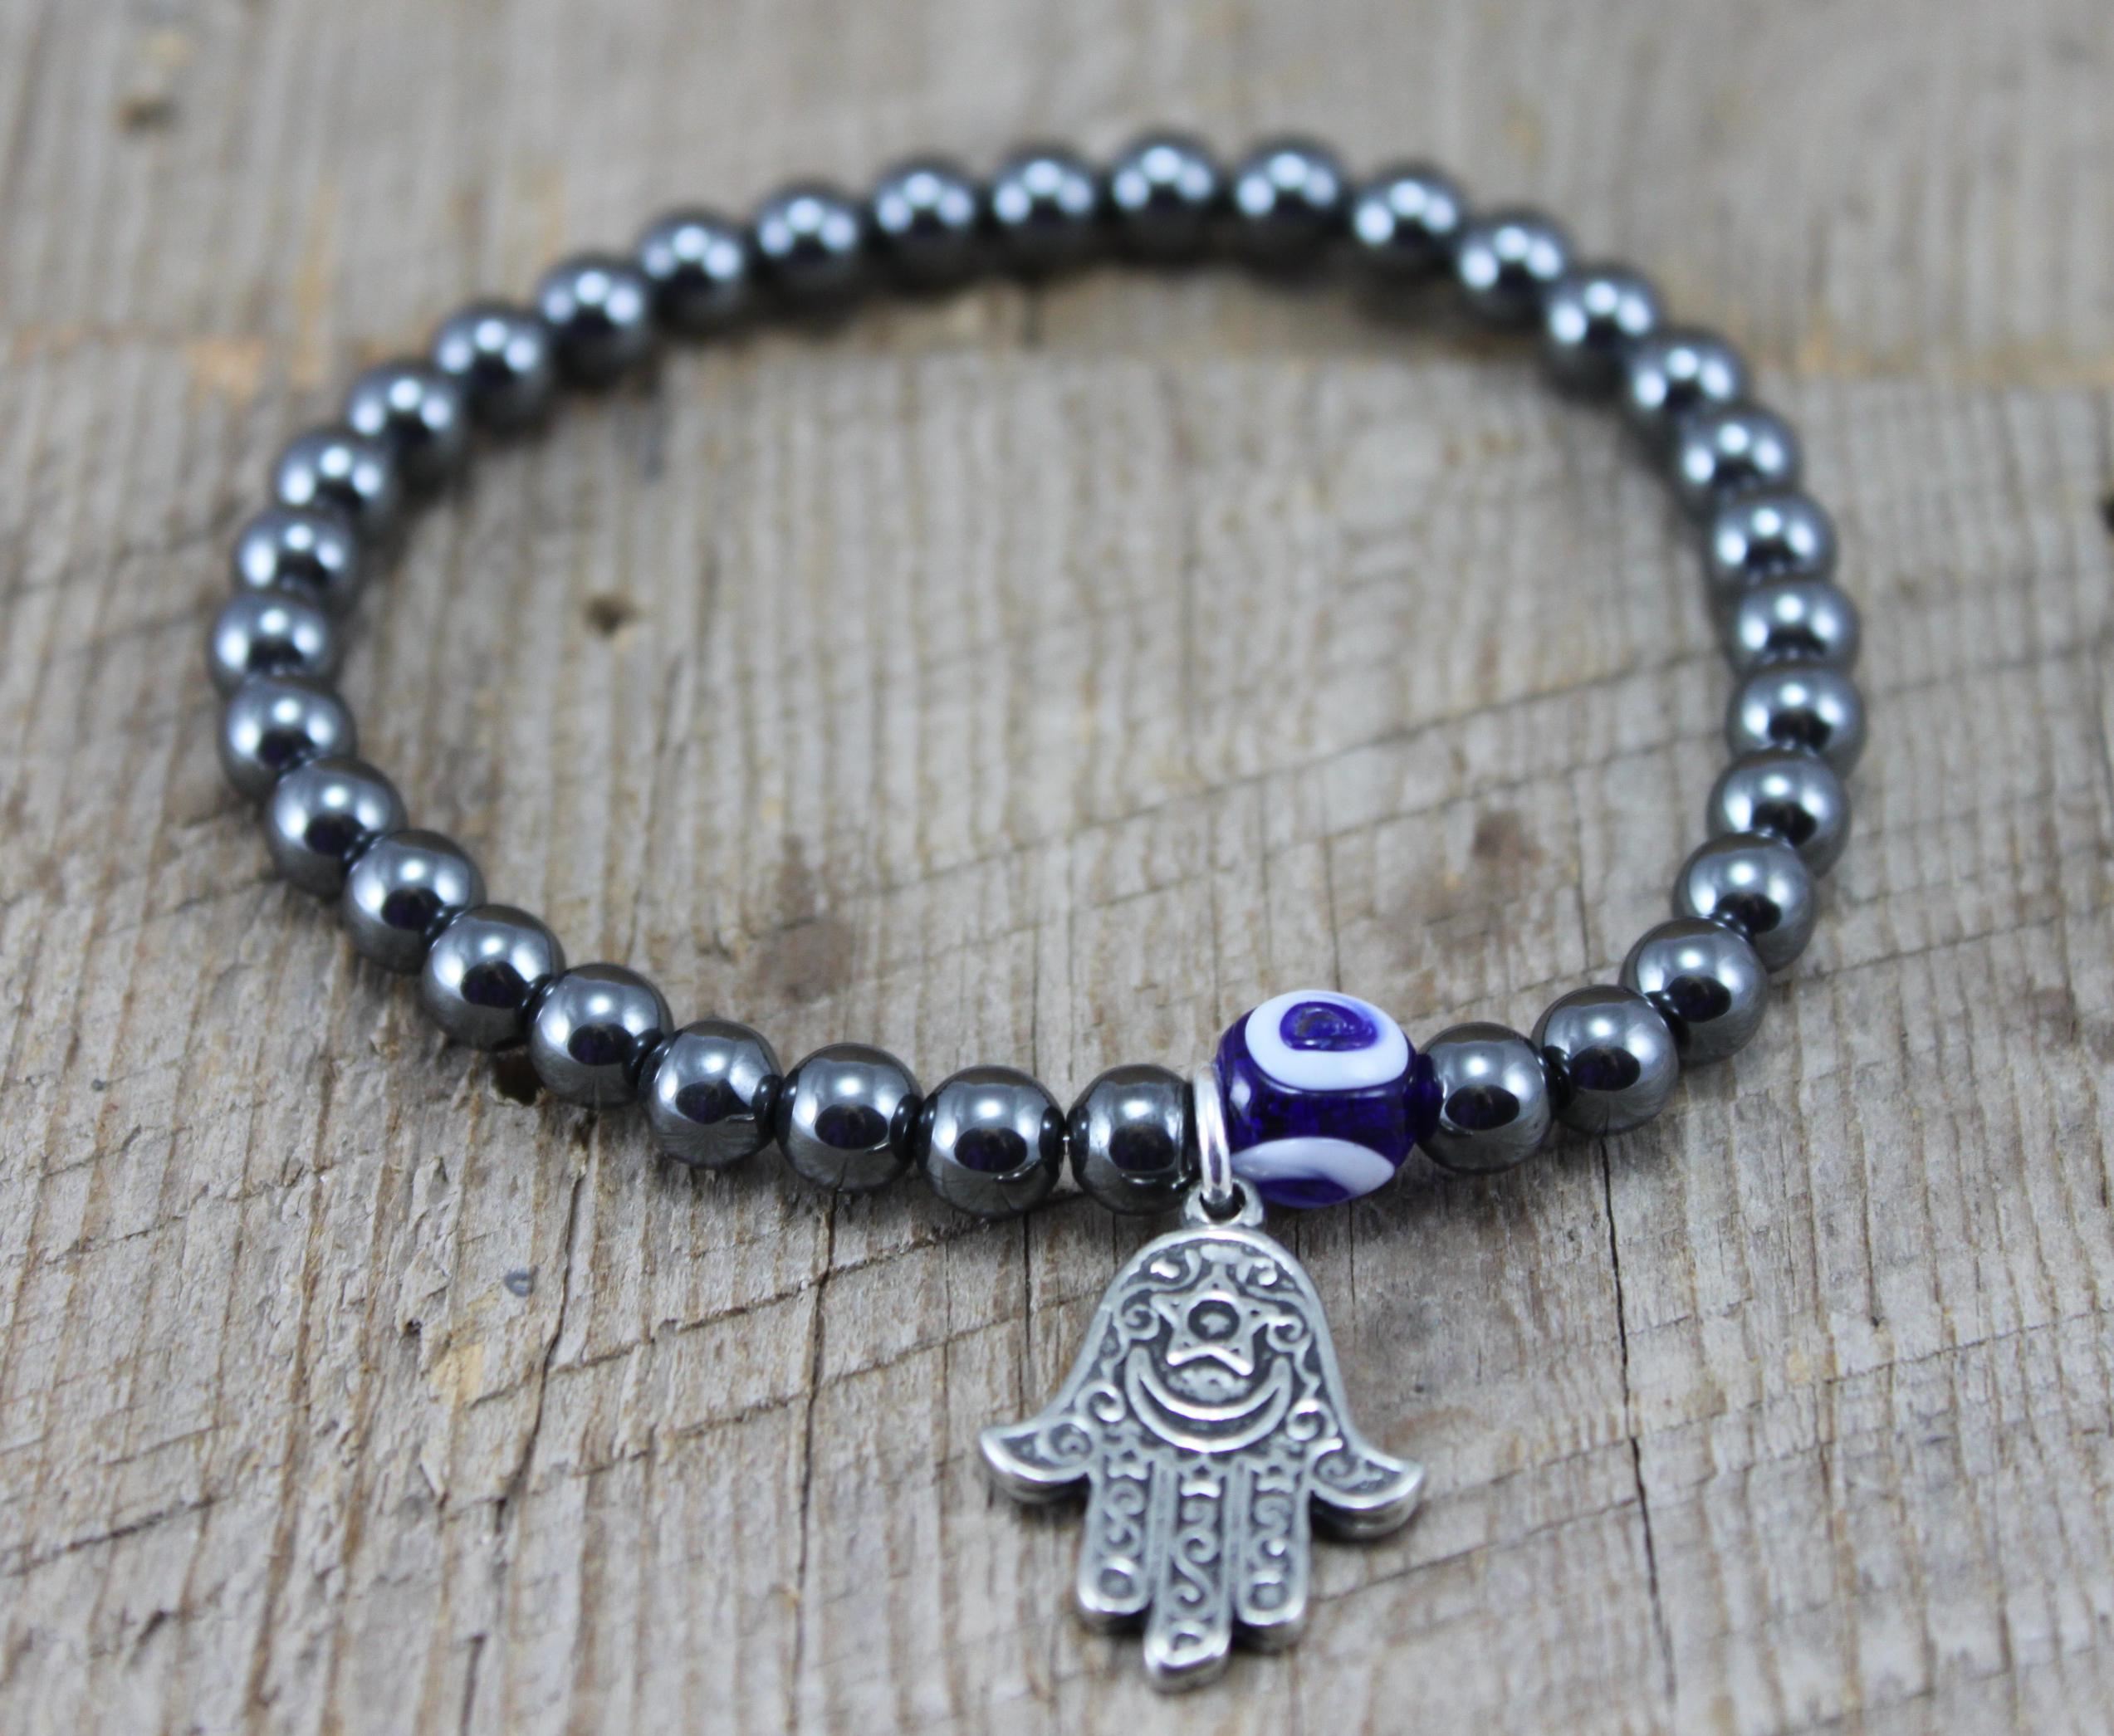 SariBlue Hematite Good Luck Charm Bracelet